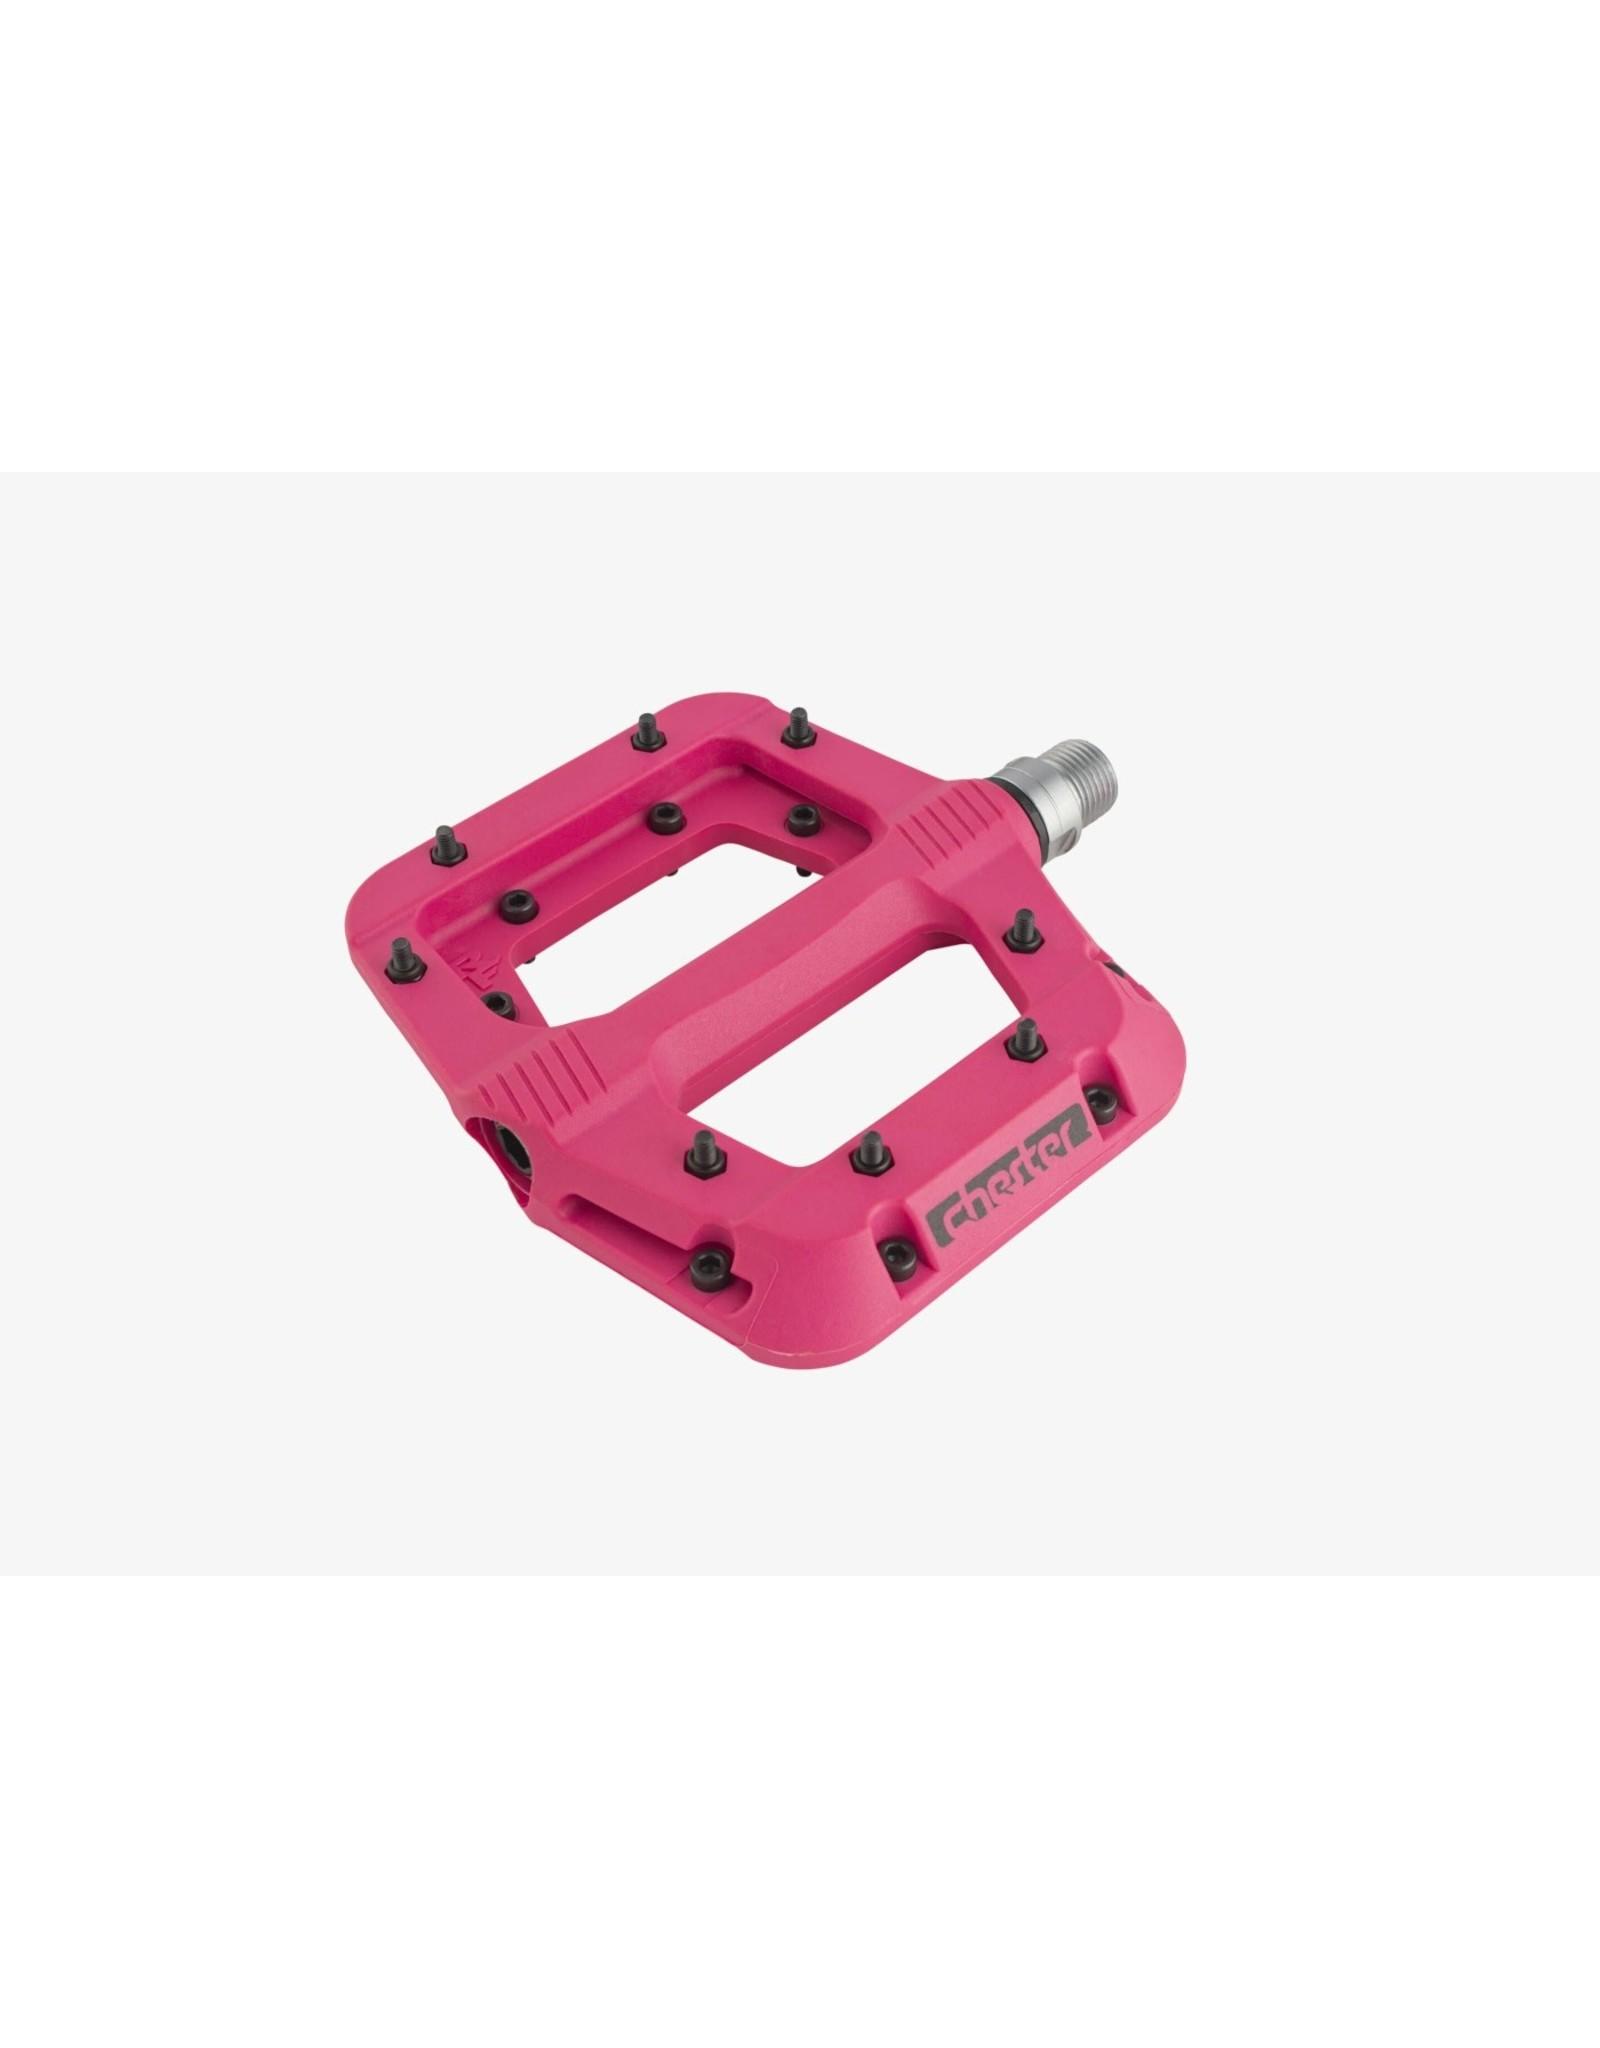 RaceFace Chester Pedals - Platform, Composite, Magenta